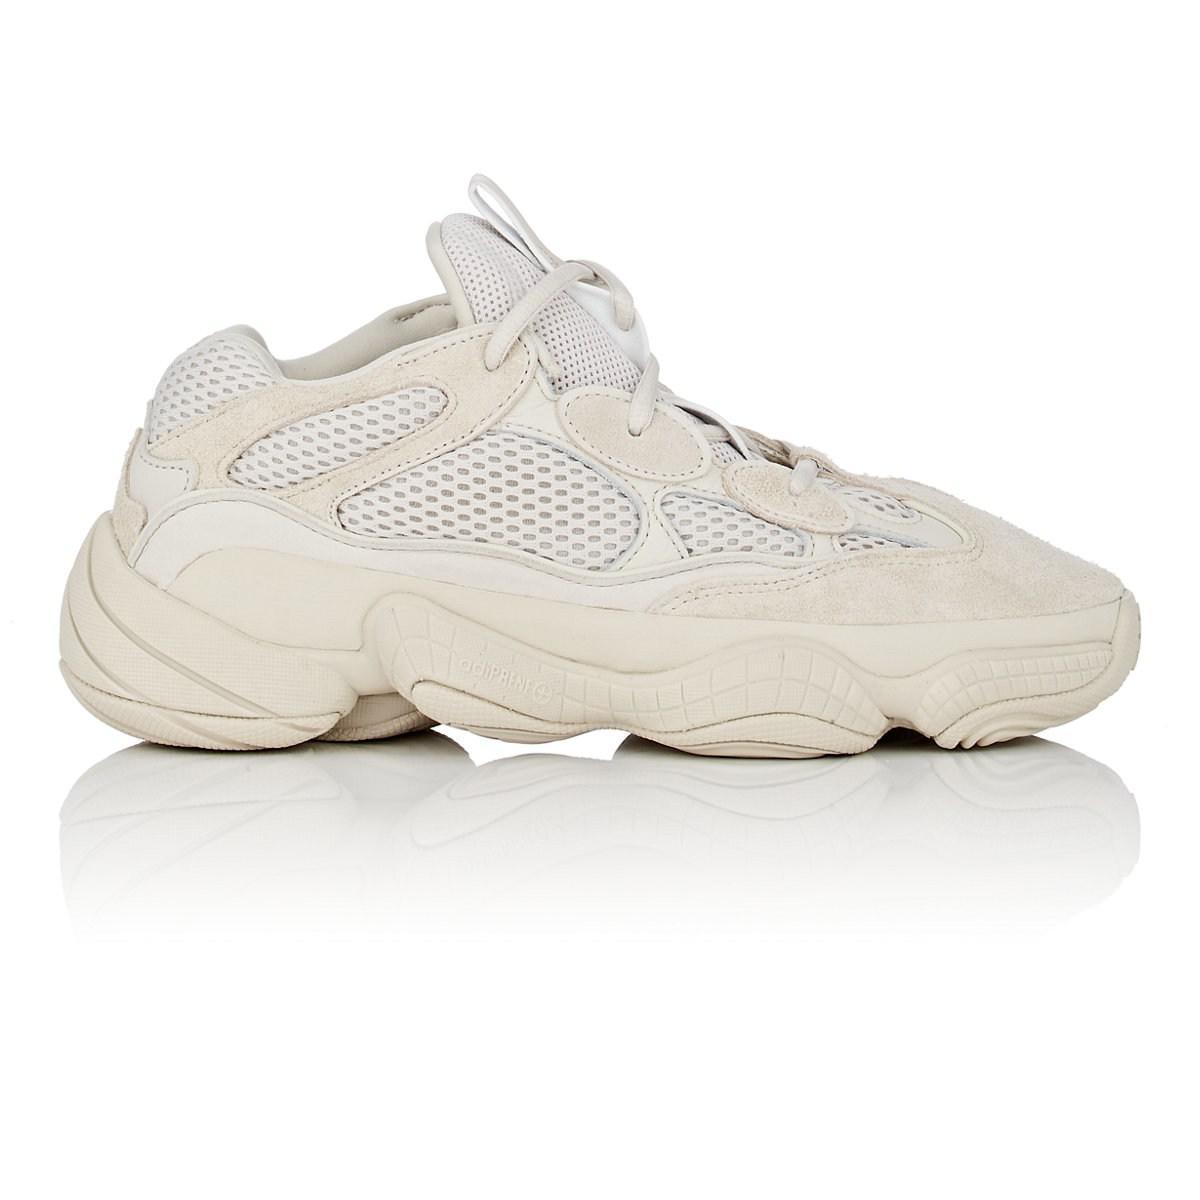 the latest 018b2 c3cf5 Yeezy Yeezy 500 Desert Rat Sneakers in White - Lyst